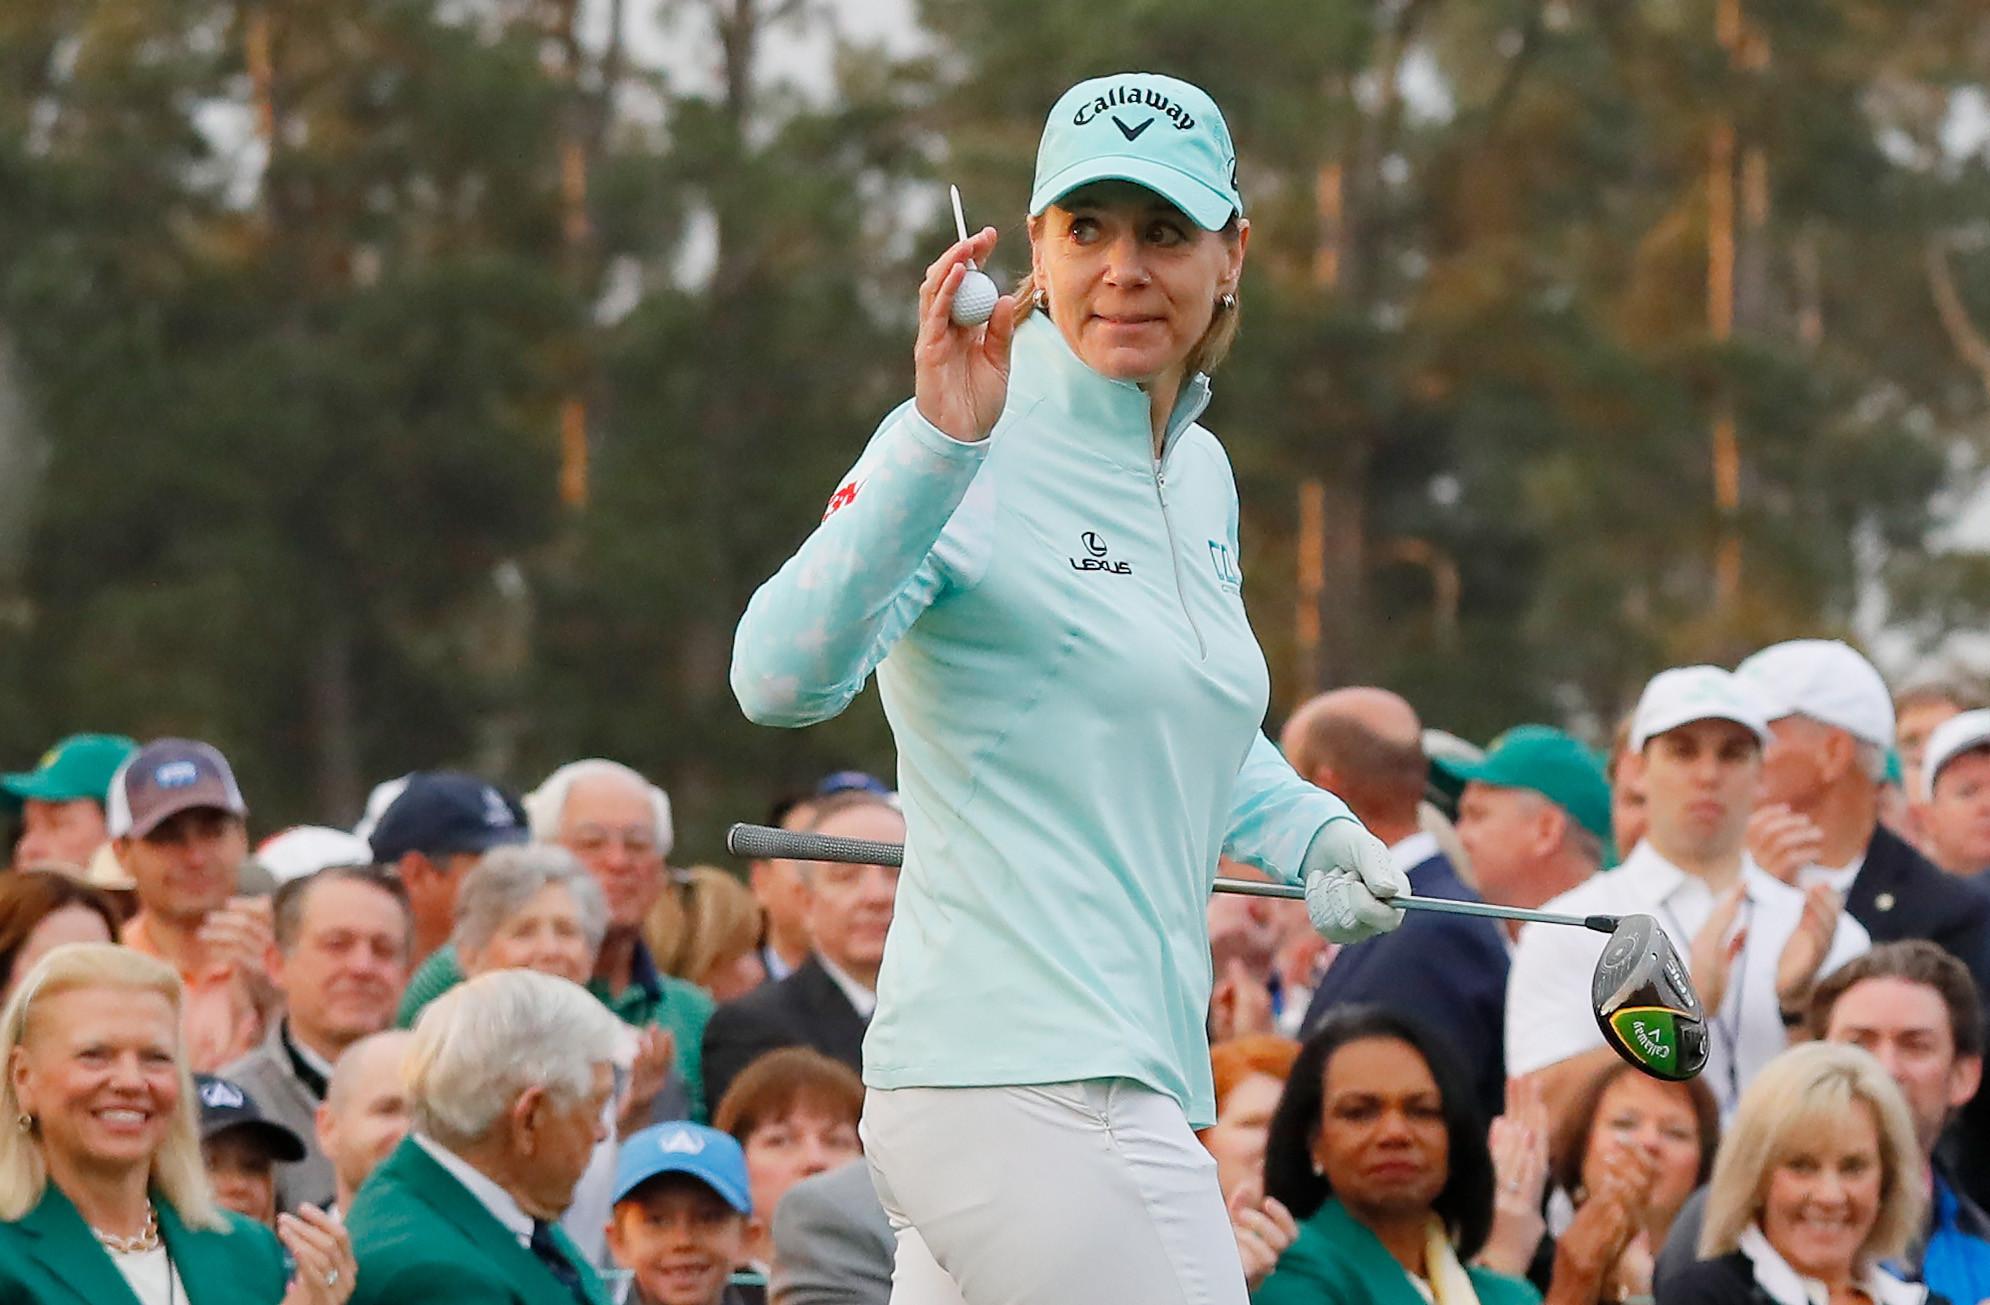 Annika Sörenstam won 10 major titles during a glittering golf career ©Getty Images